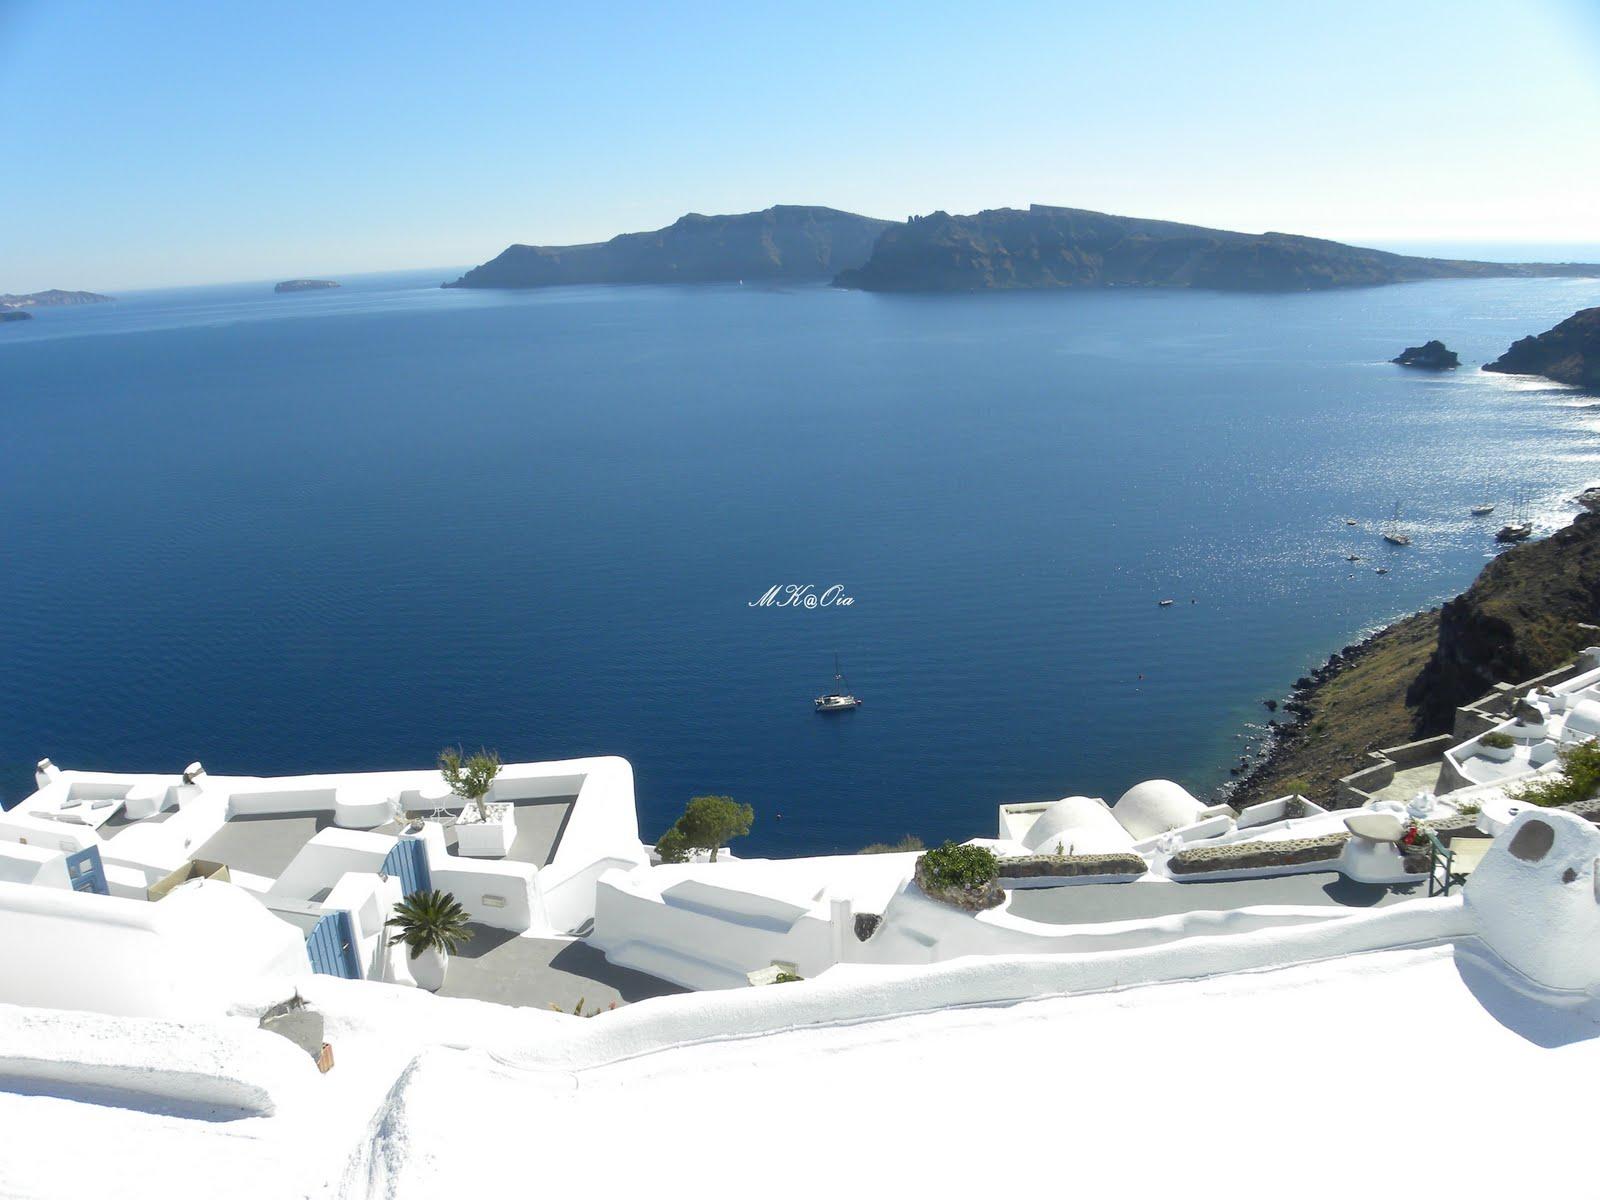 MK胡言亂語: 希臘自助旅行(八)_ 聖托里尼島_伊亞_Part-2 (Santorini_Oia_Part-2) (2010/05/04)